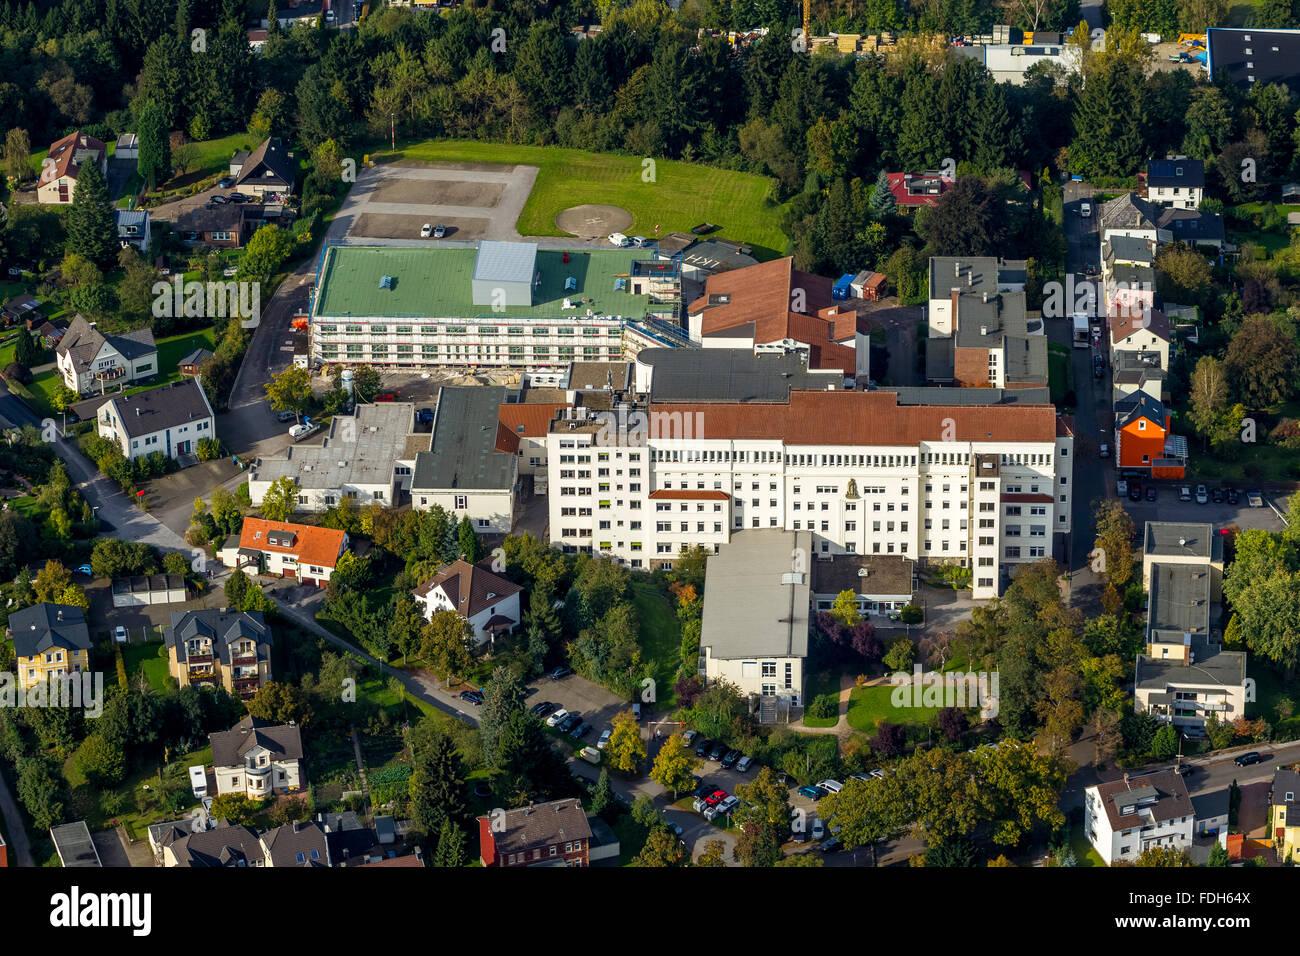 Aerial view, Lung Clinic Hemer, Hemer, Sauerland, North Rhine-Westphalia, Germany, Europe, Aerial view, birds-eyes - Stock Image